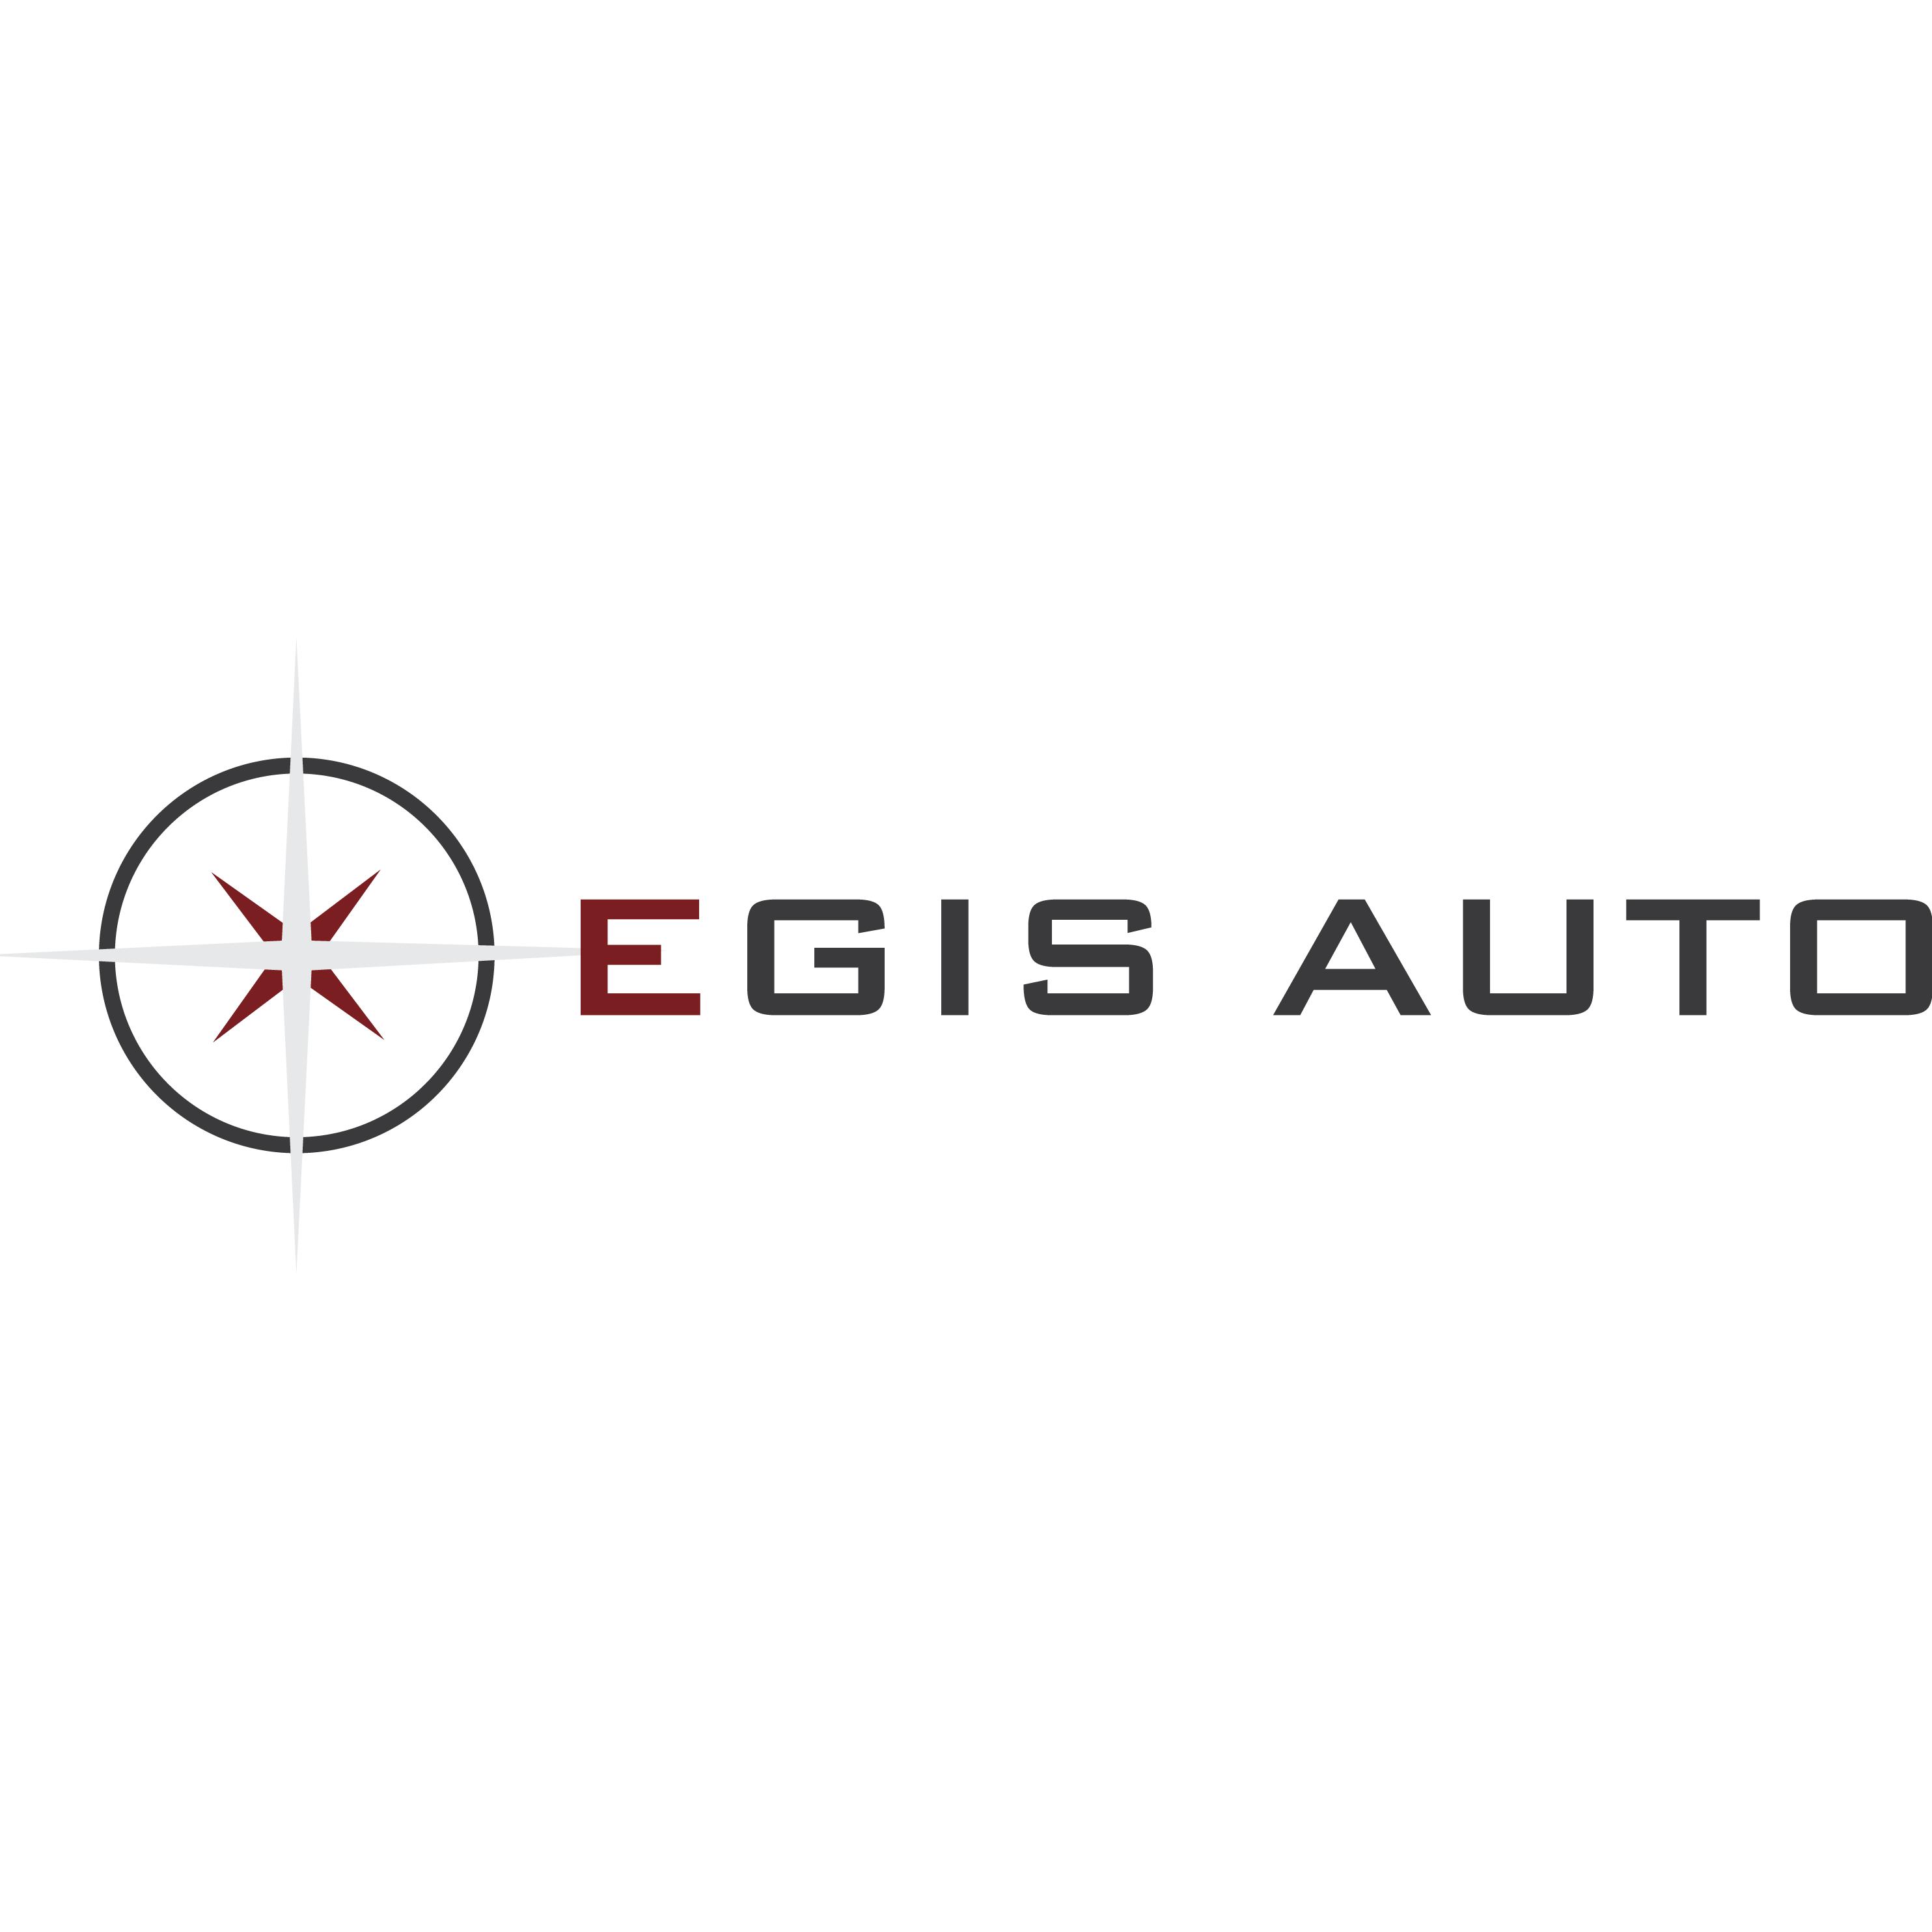 Egis Auto image 1